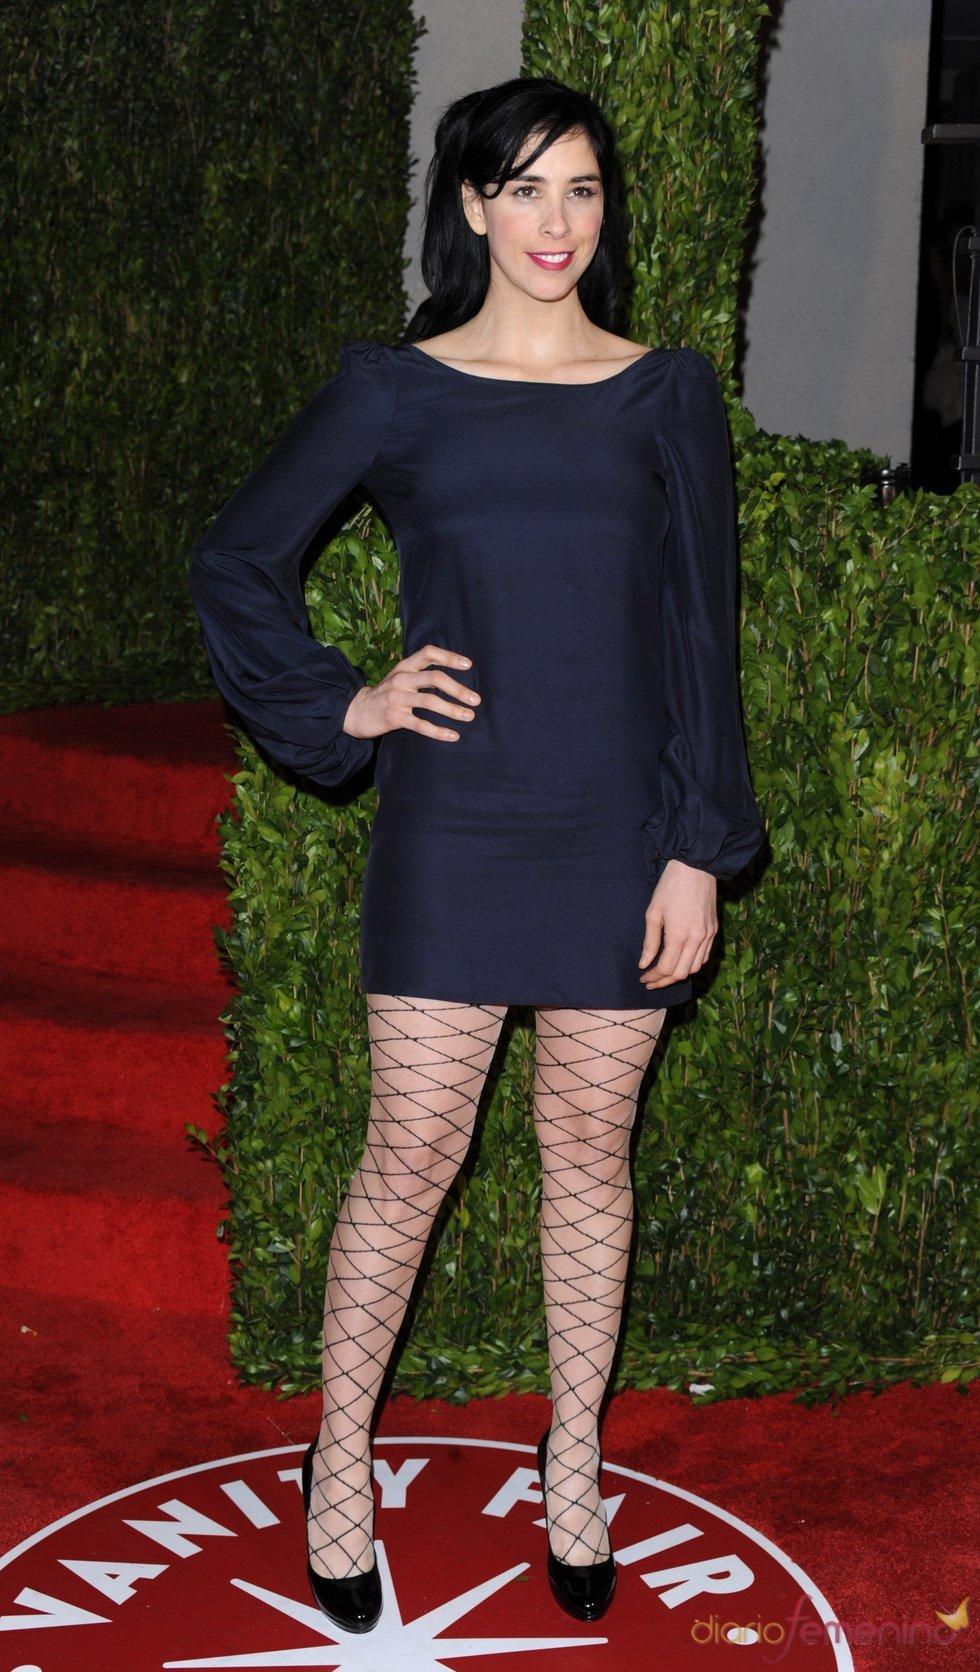 Sarah Silverman en la fiesta Vanity Fair Oscar 2010